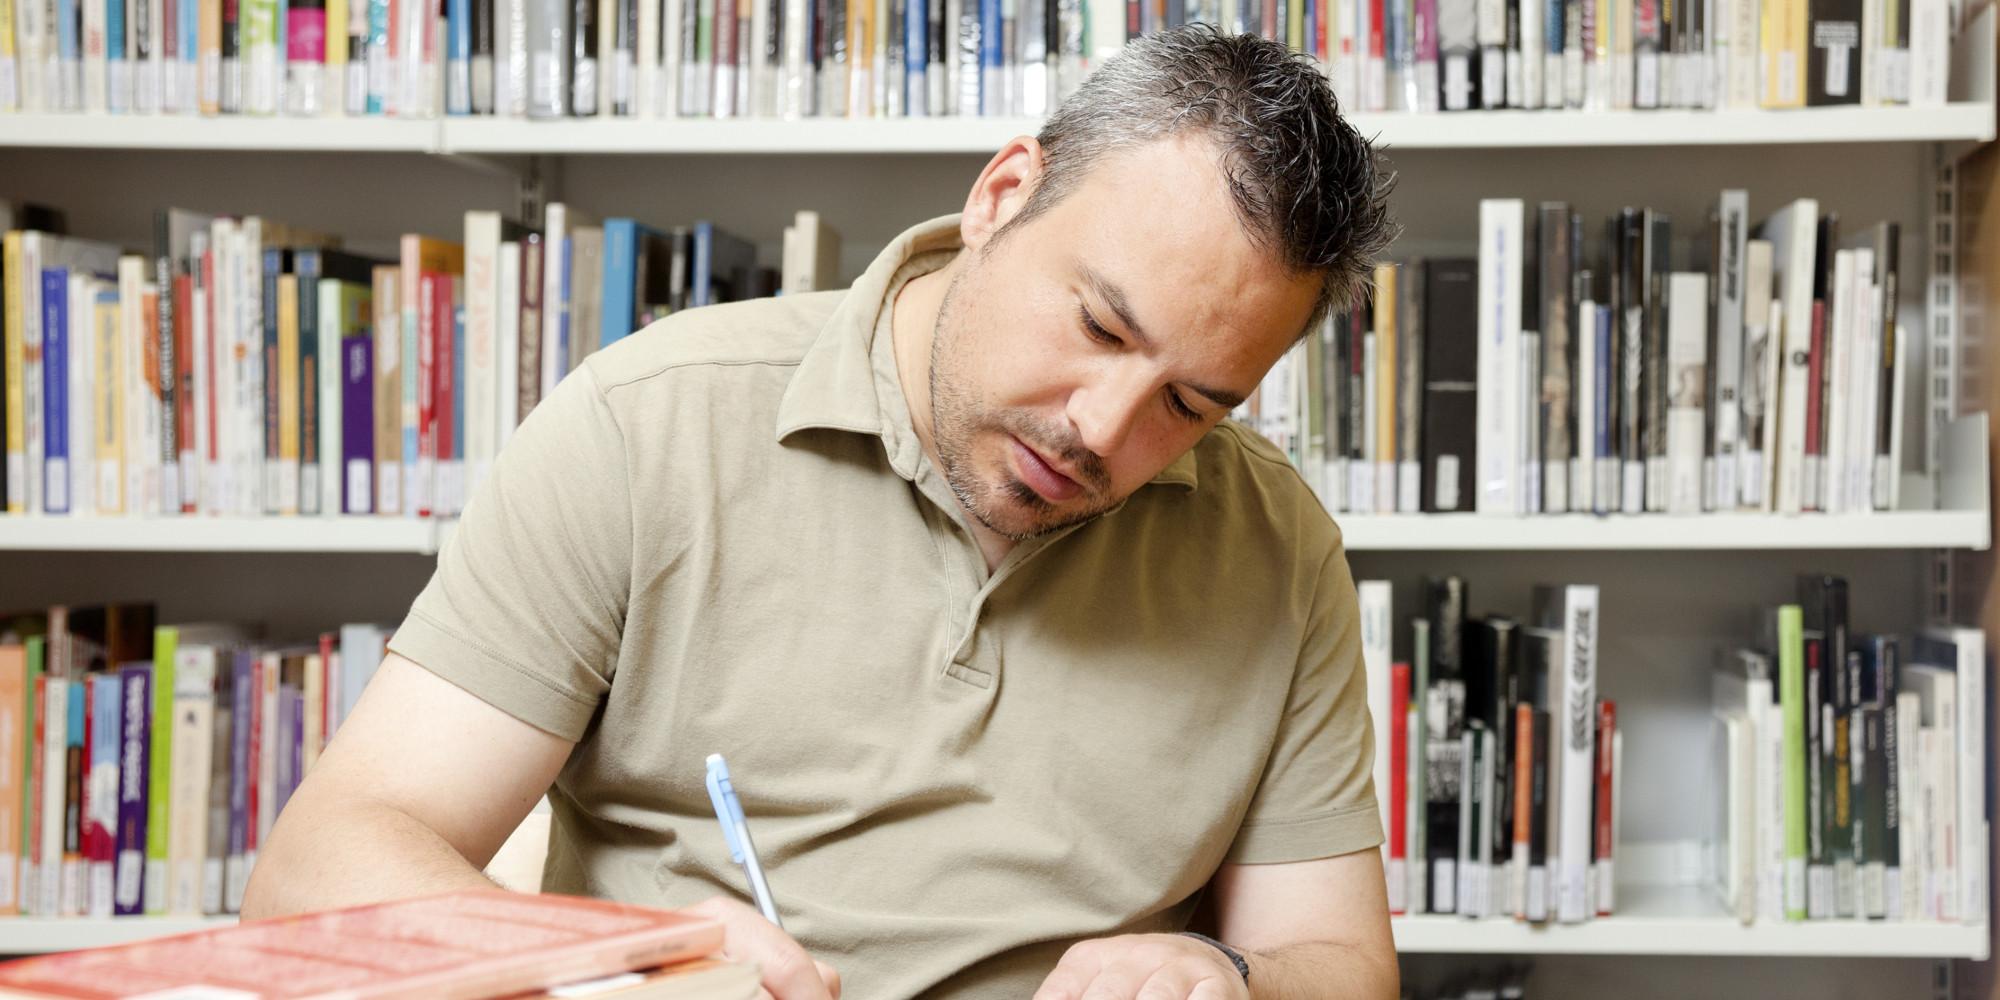 Accounting career plan essay image 5